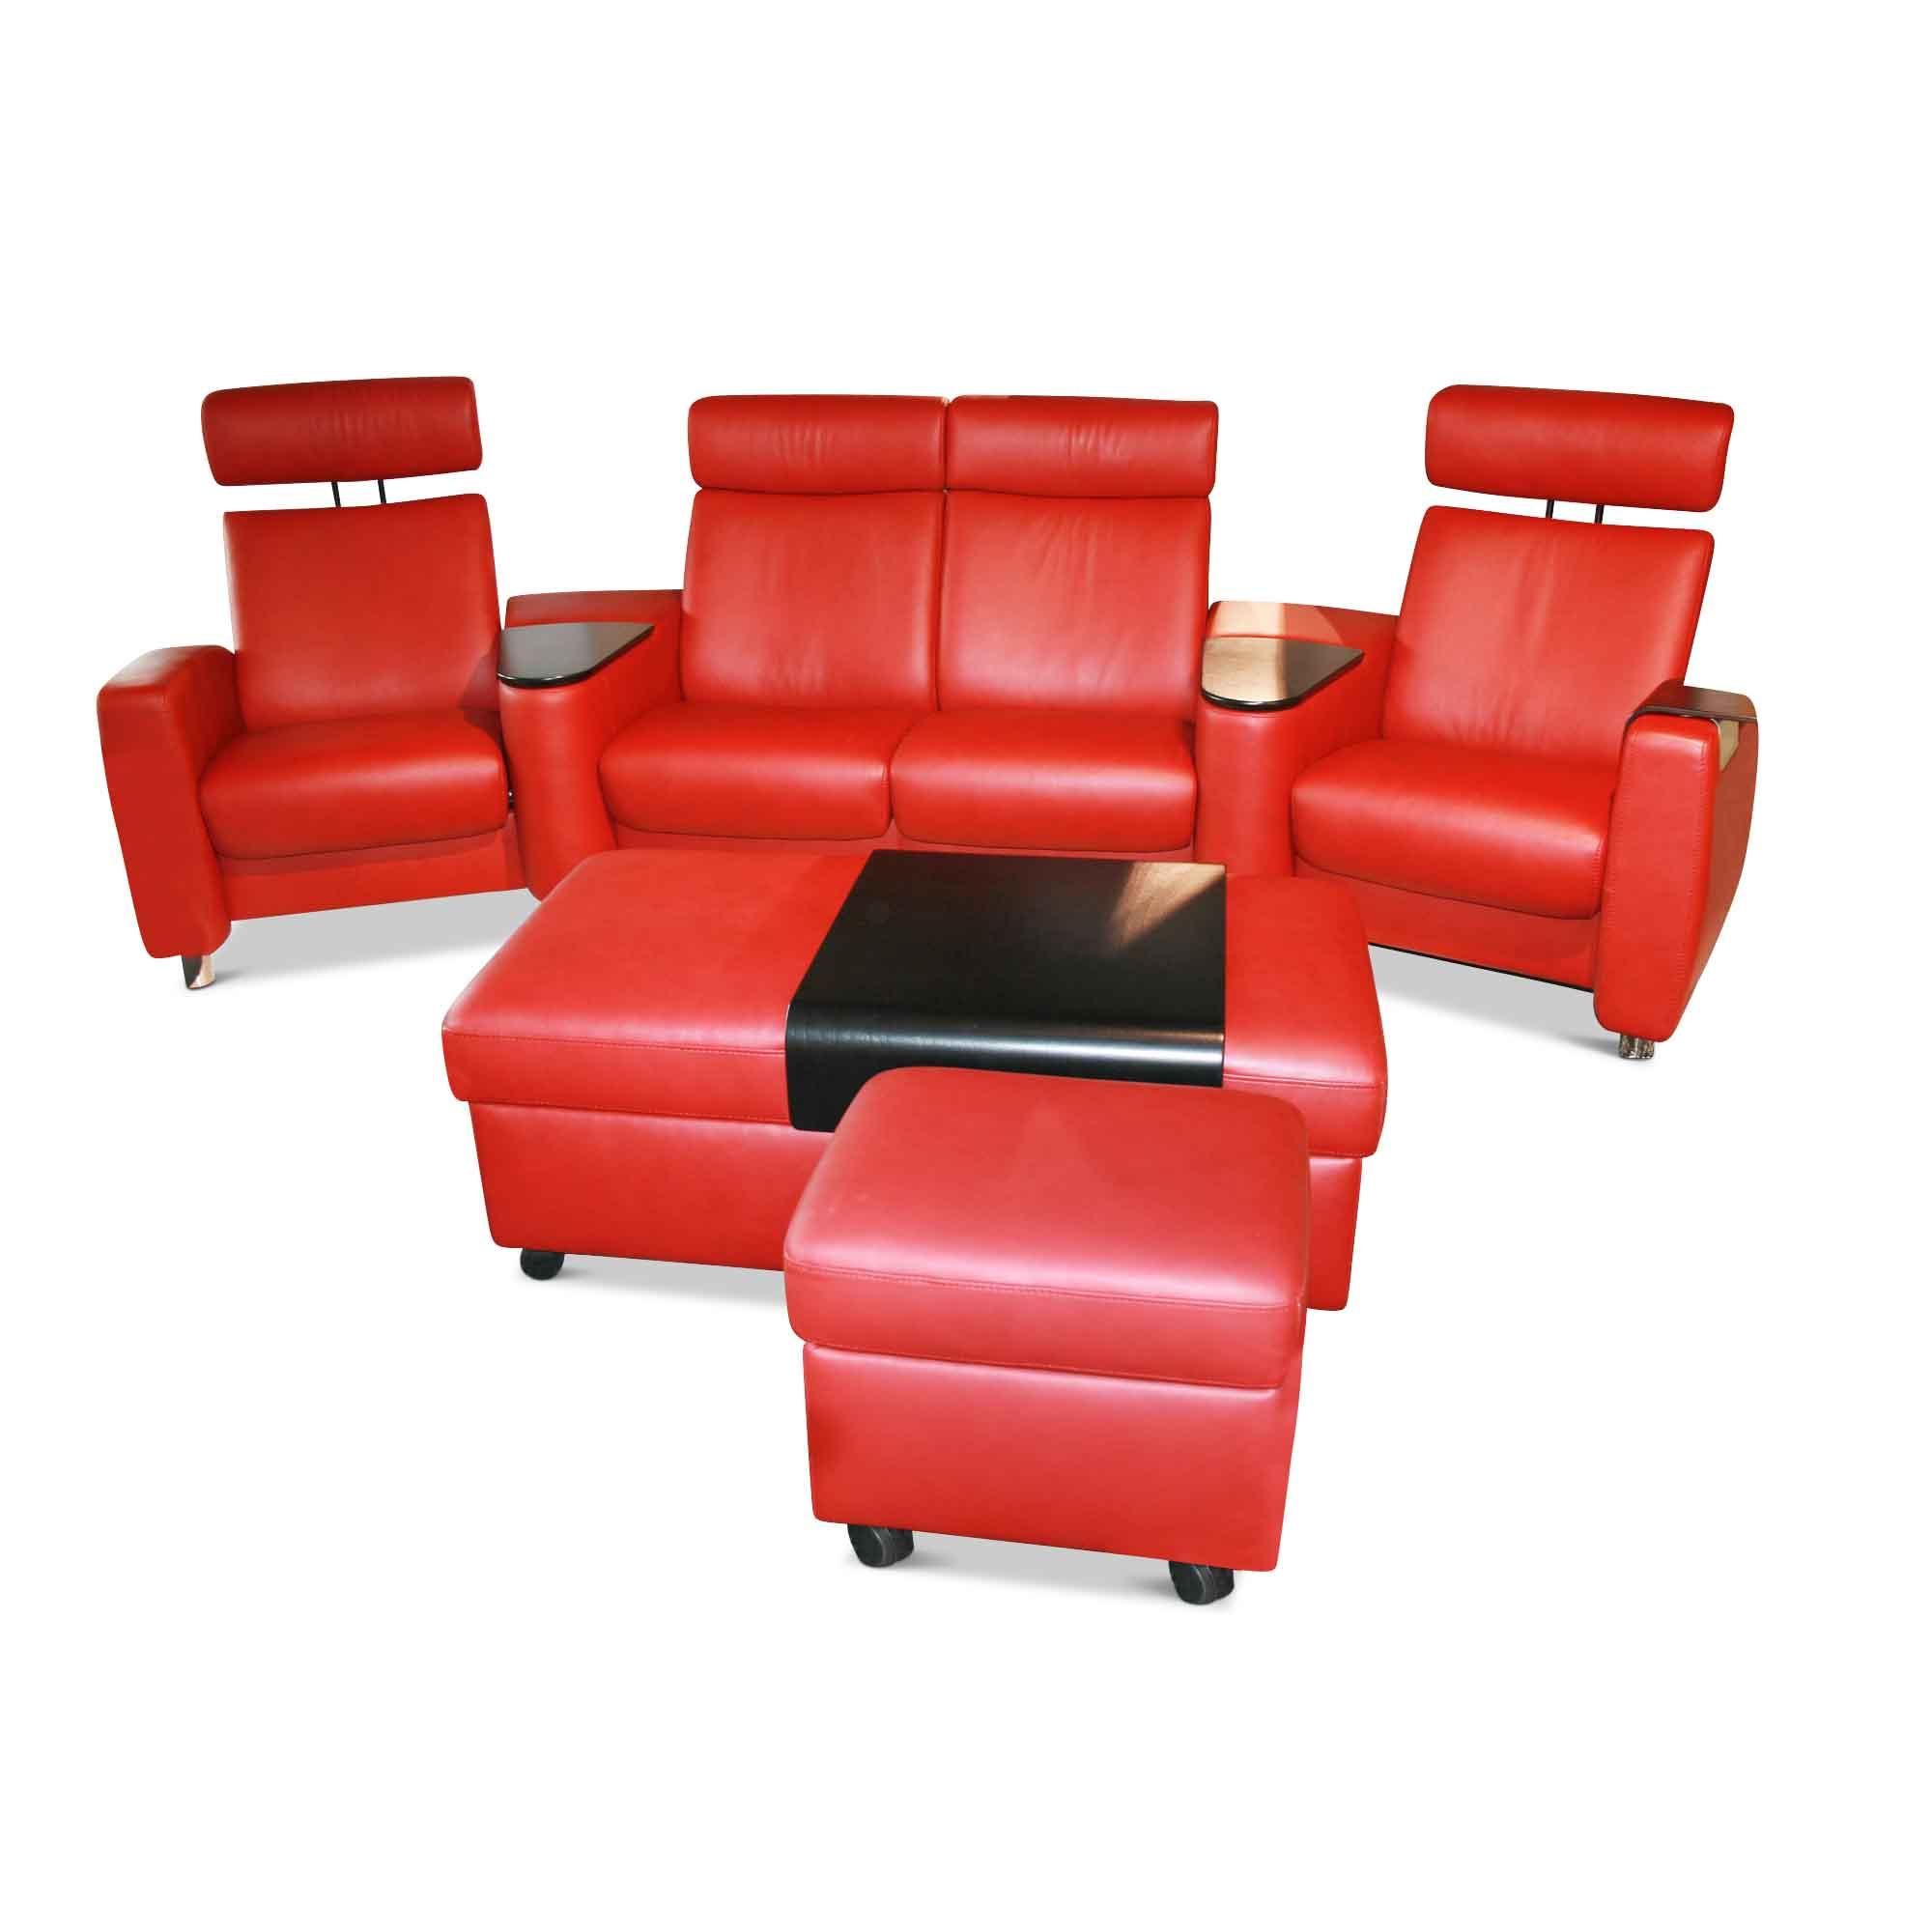 sofa arion mit hocker rot stressless sofas g nstig. Black Bedroom Furniture Sets. Home Design Ideas